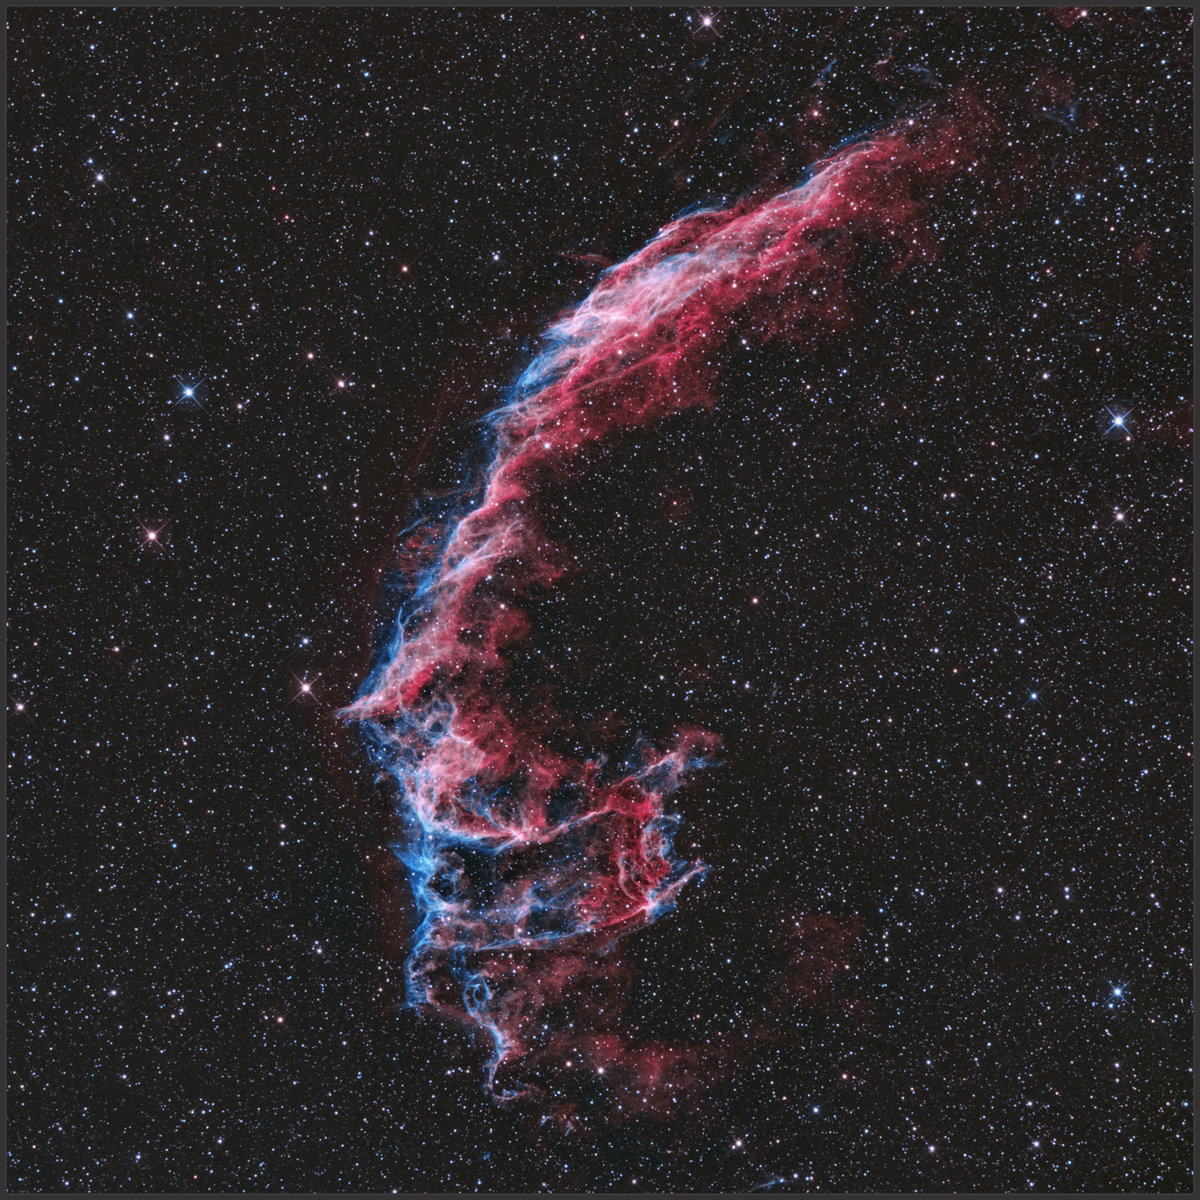 59a1234c8b682_NGC6992AF.thumb.jpg.f98baf652c252d93c6944504ce65a1a4.jpg